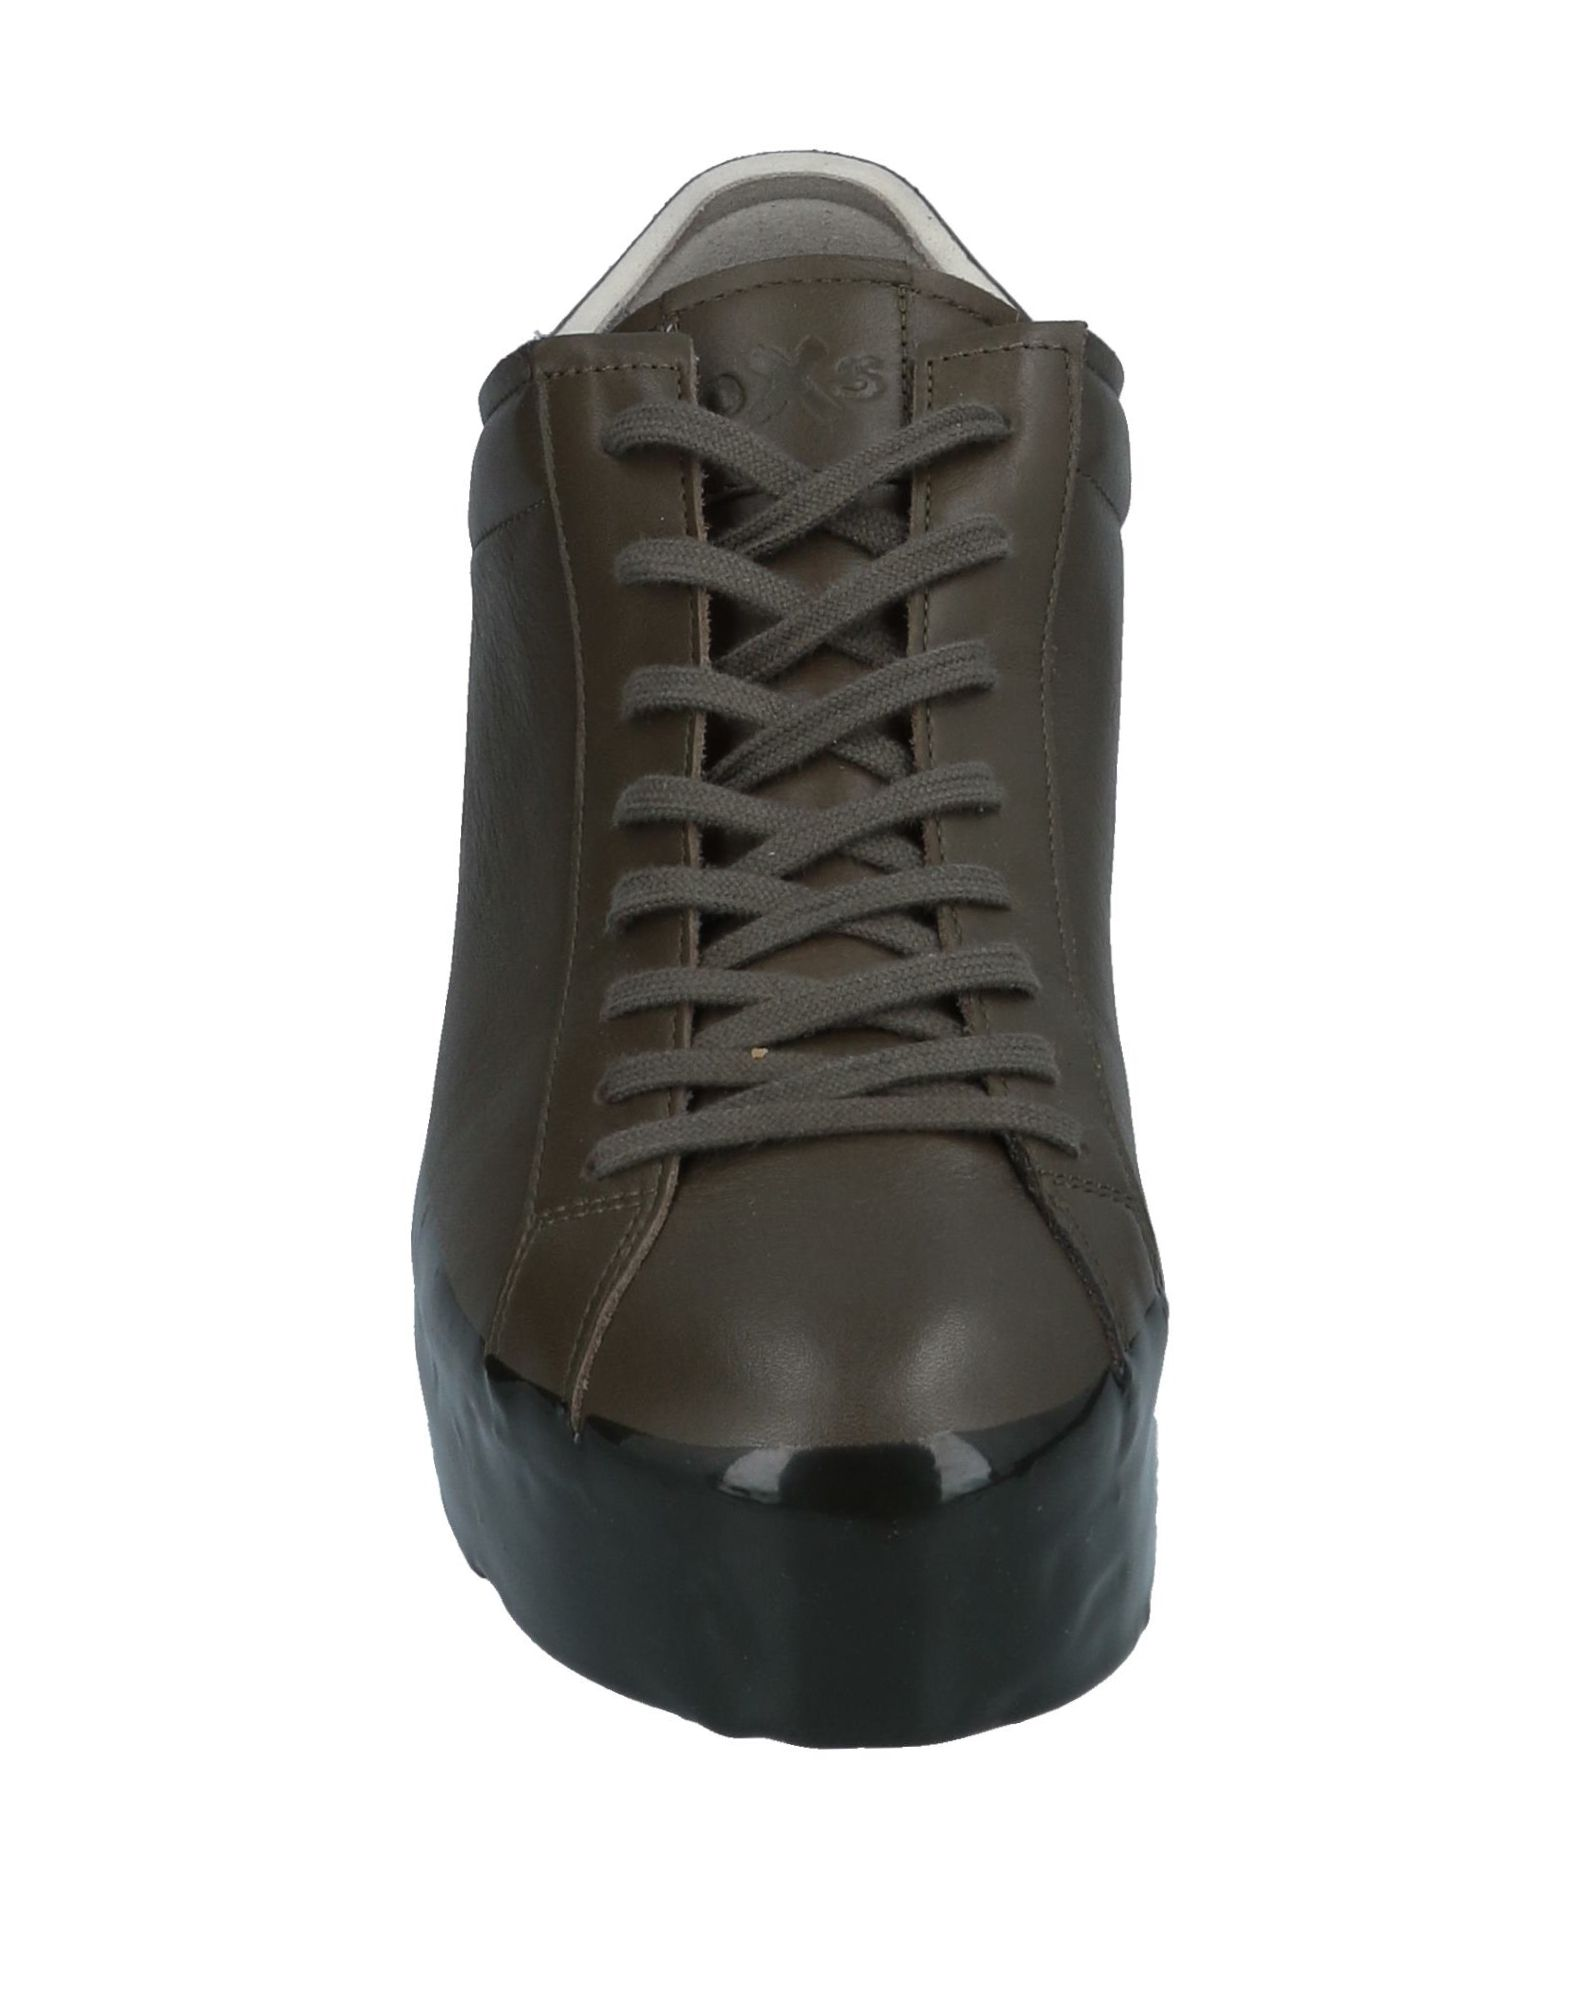 O.X.S. Rubber Gute Soul Sneakers Herren  11555083QT Gute Rubber Qualität beliebte Schuhe 23eaf2